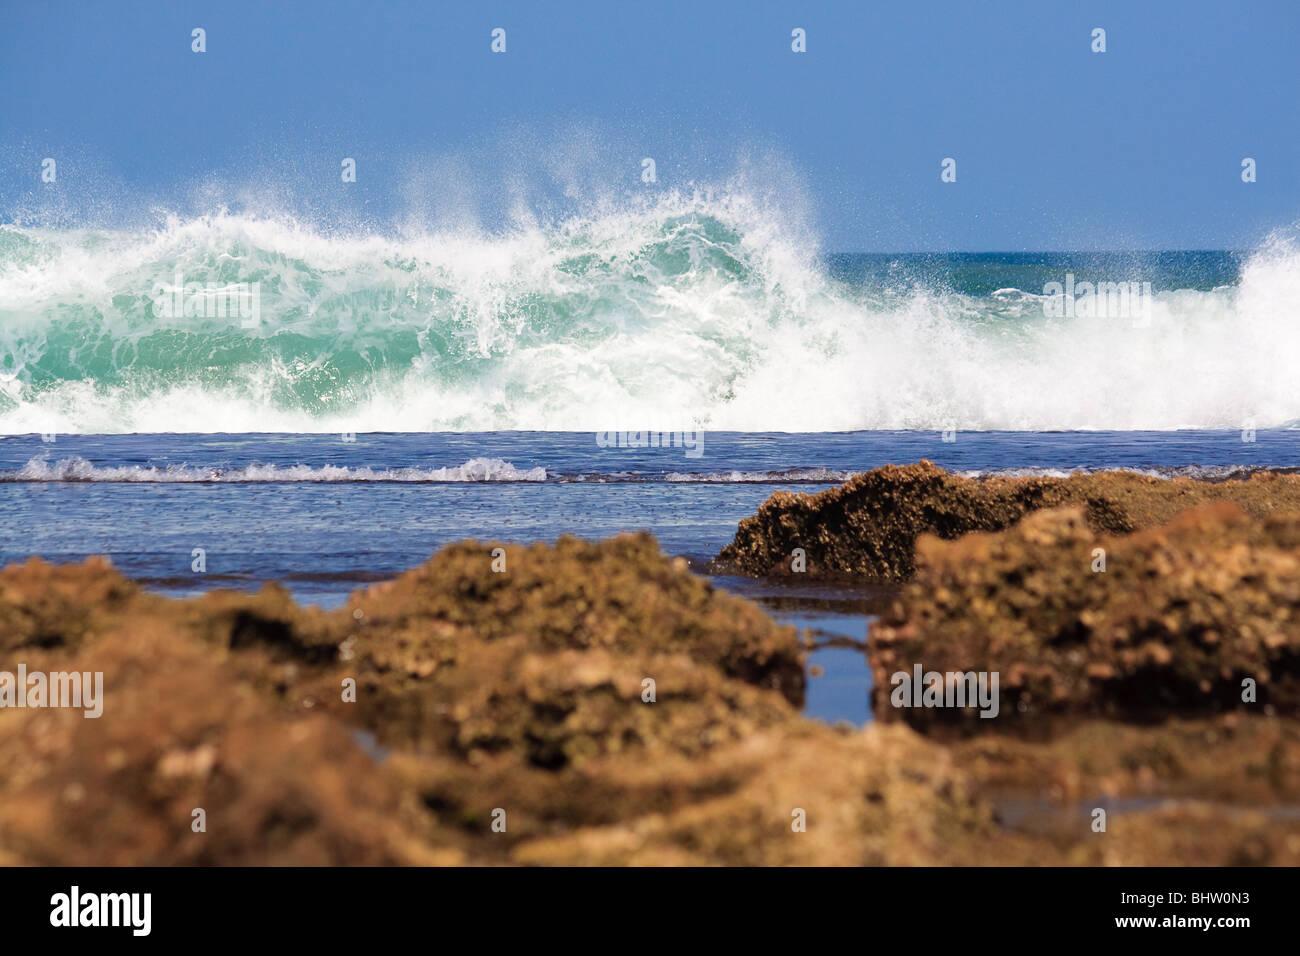 Plage de l'Atlantique Afrique Mozambique Xai-Xai Mer Ciel Photo Stock